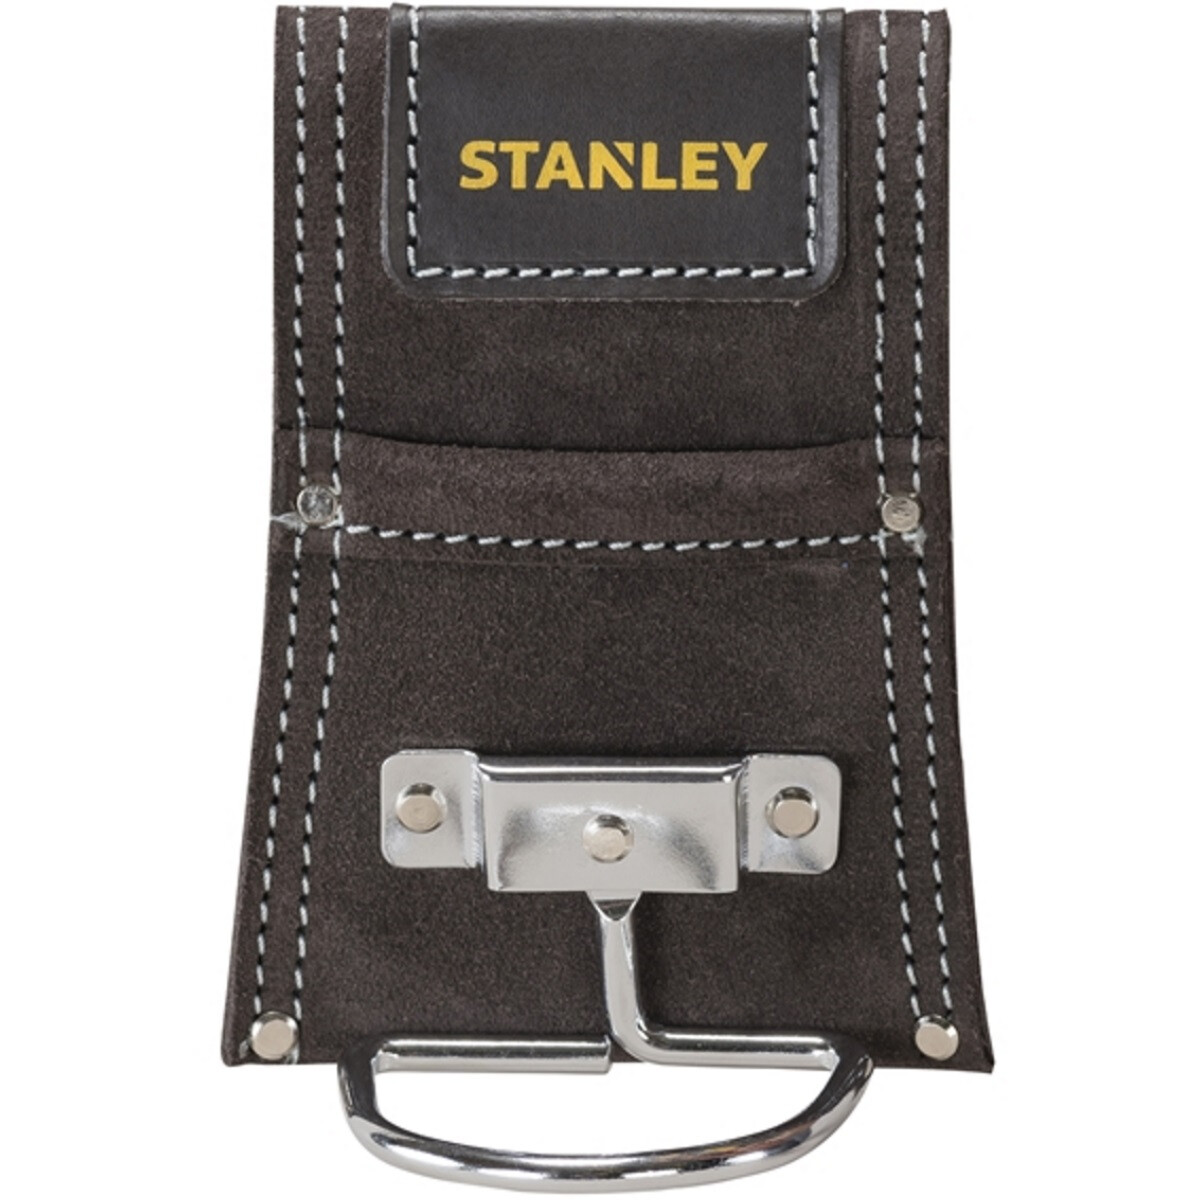 Stanley STST1-80117 Leather Hammer Holder Loop STA180117